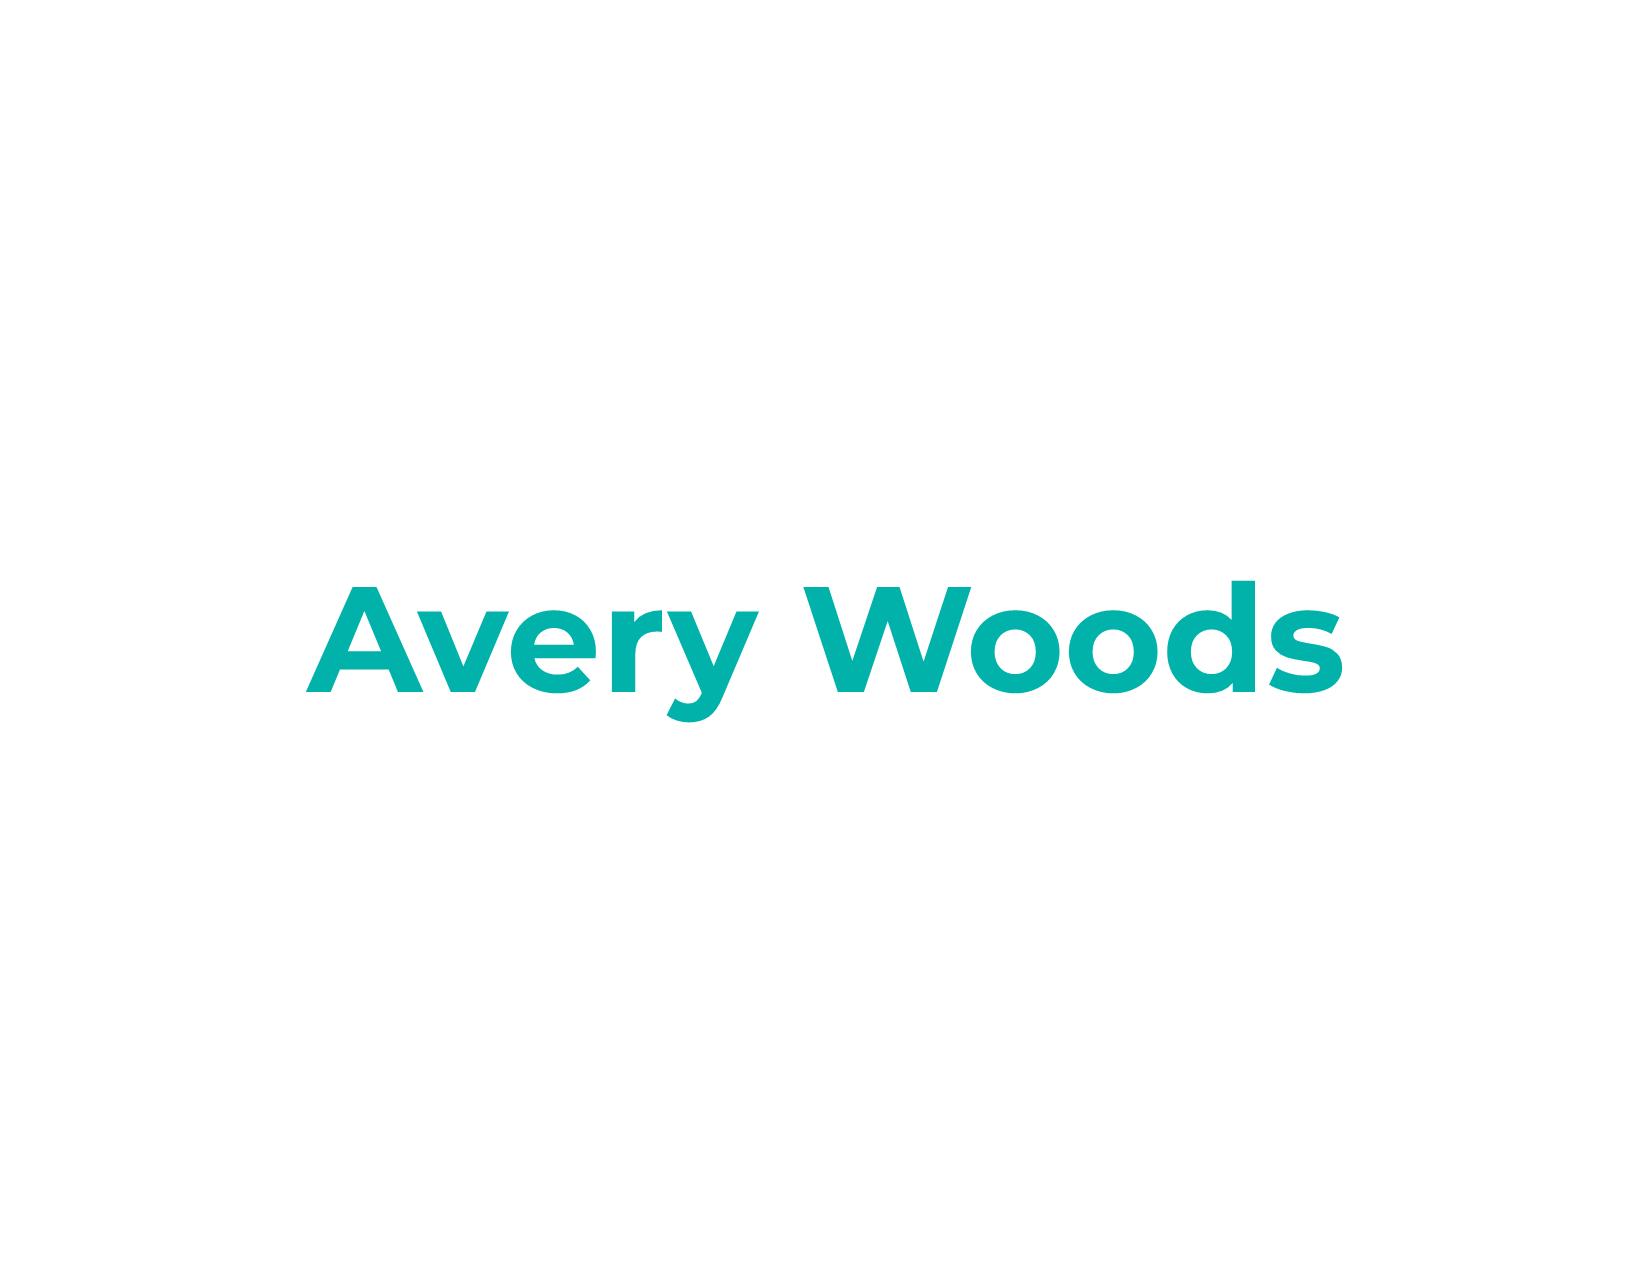 Avery Woods